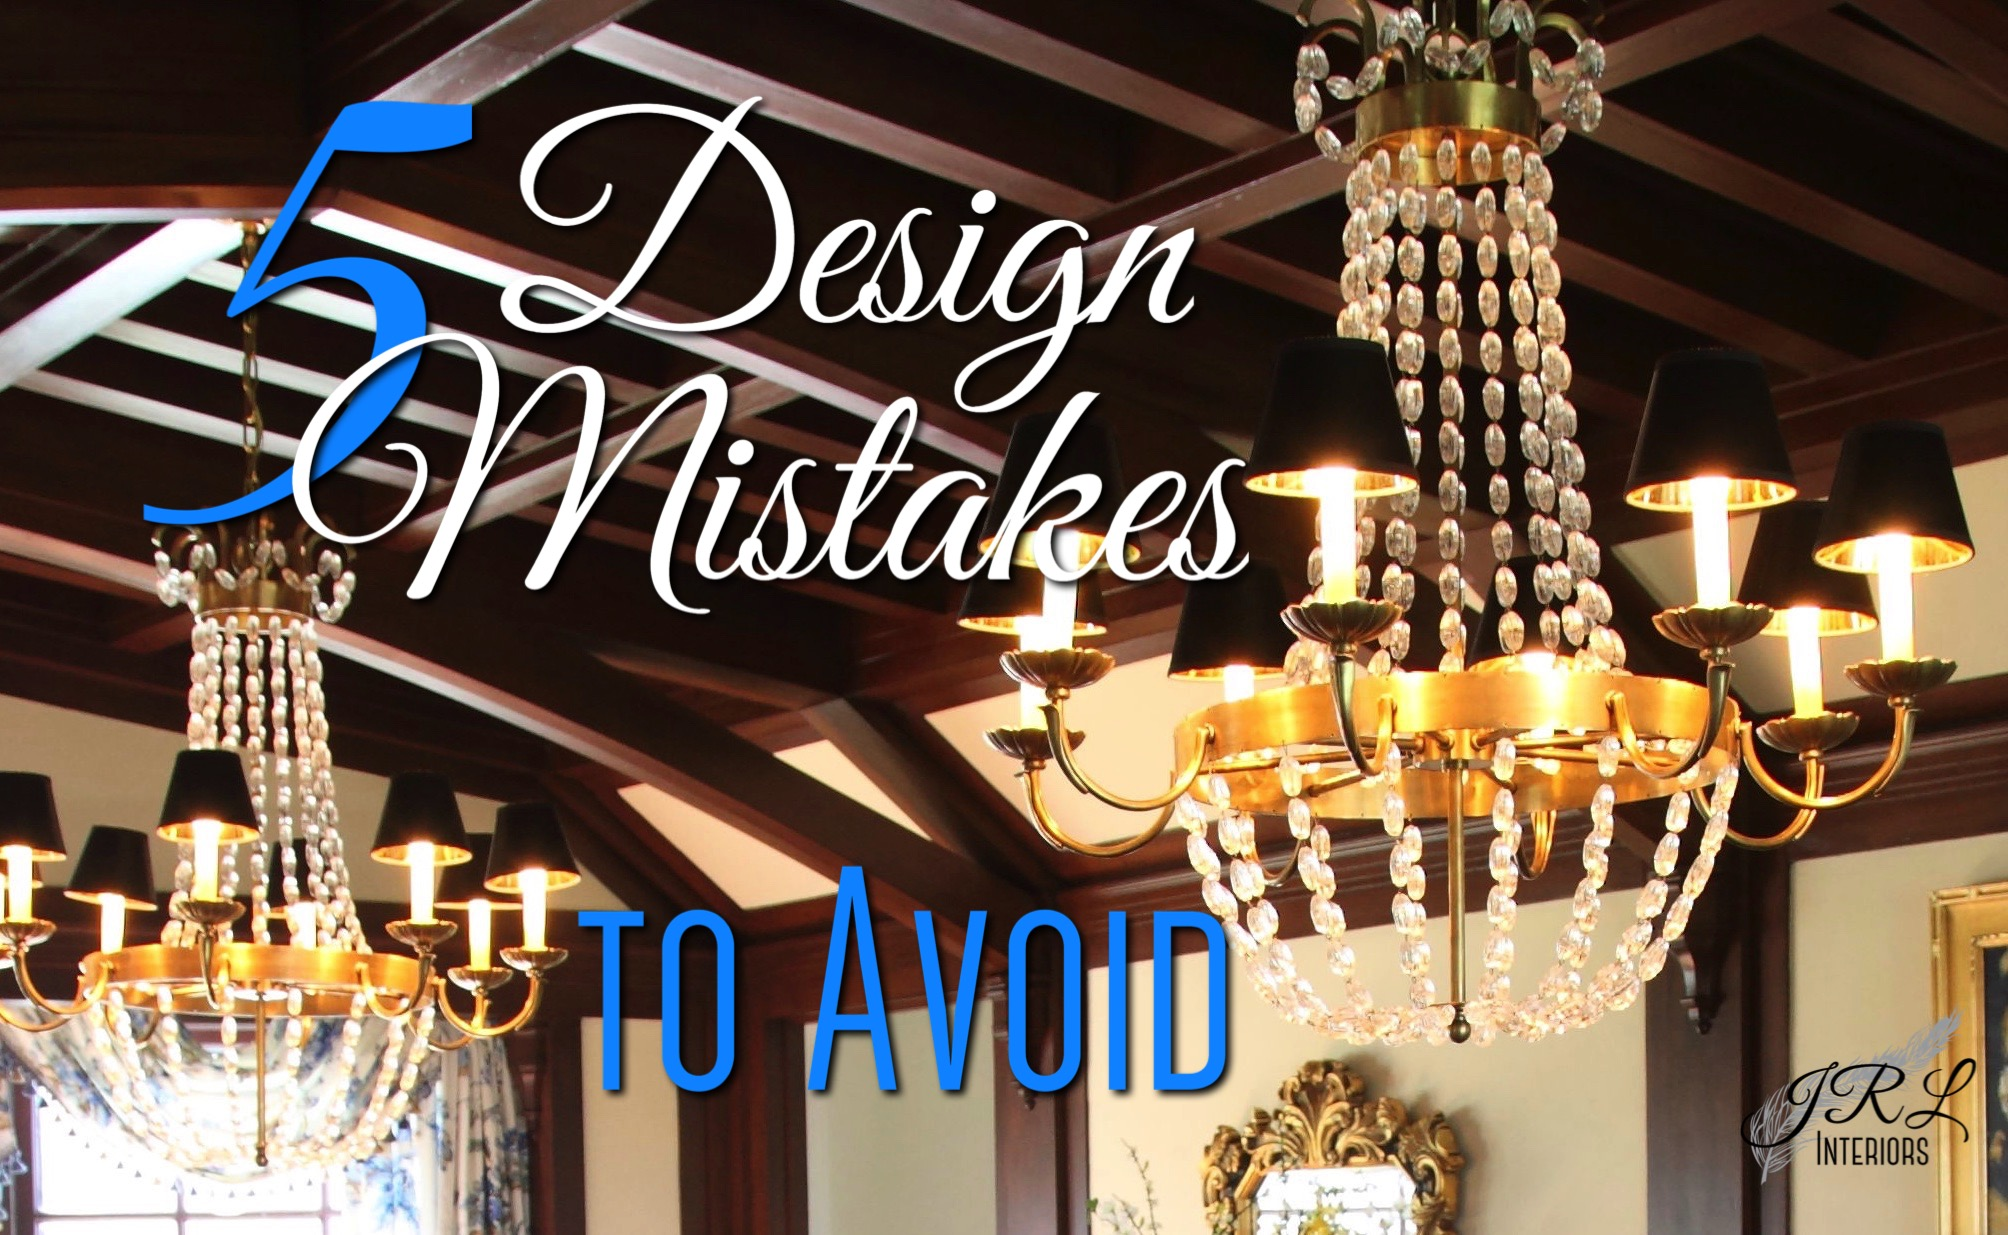 5 Design Mistakes to Avoid